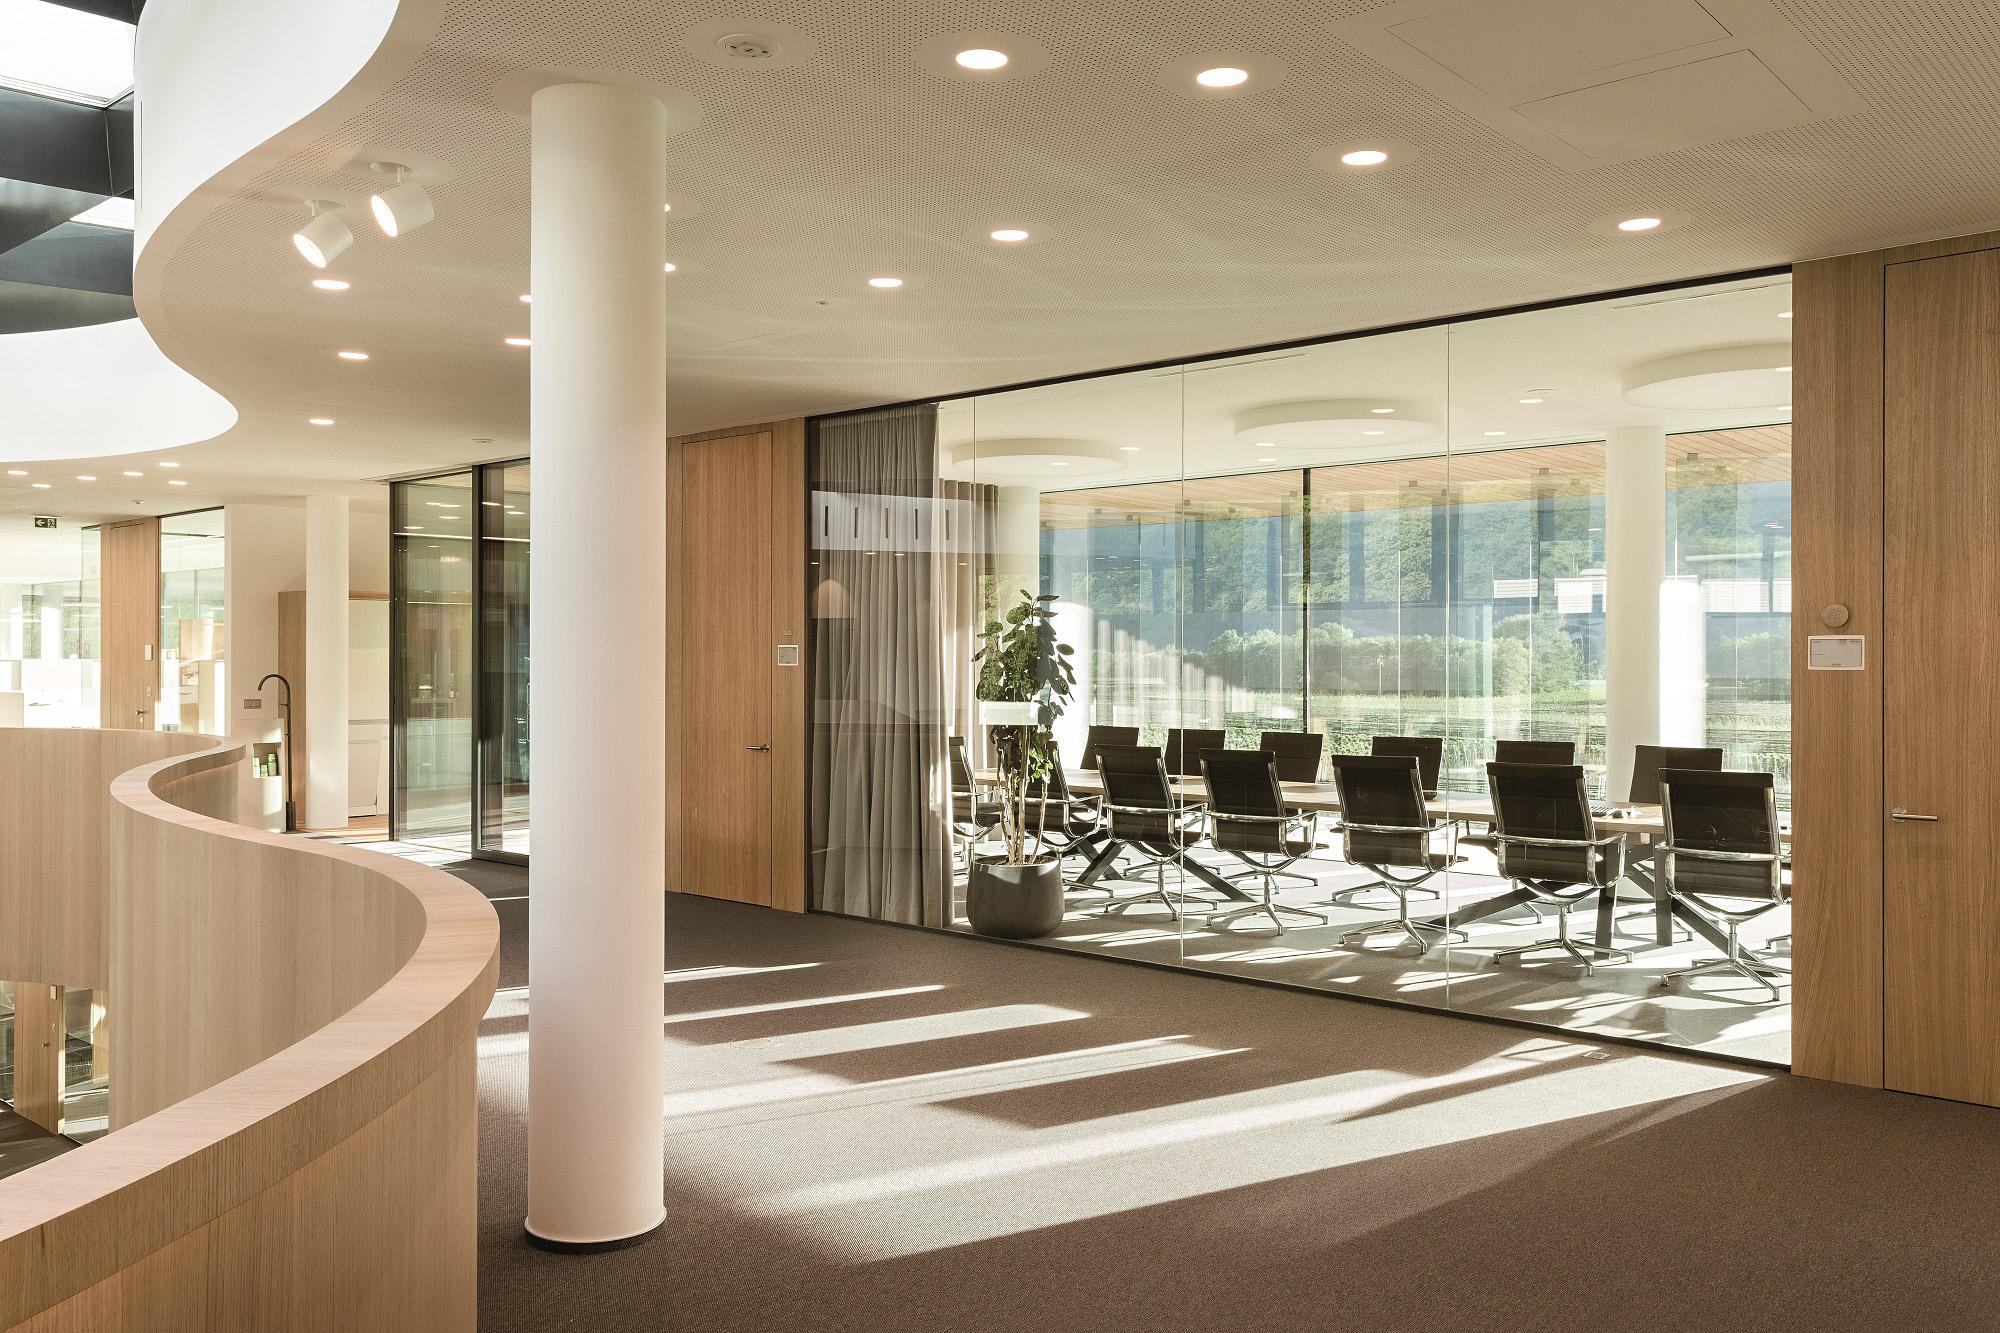 Sitzungsraum_3.0g_meranerhauser